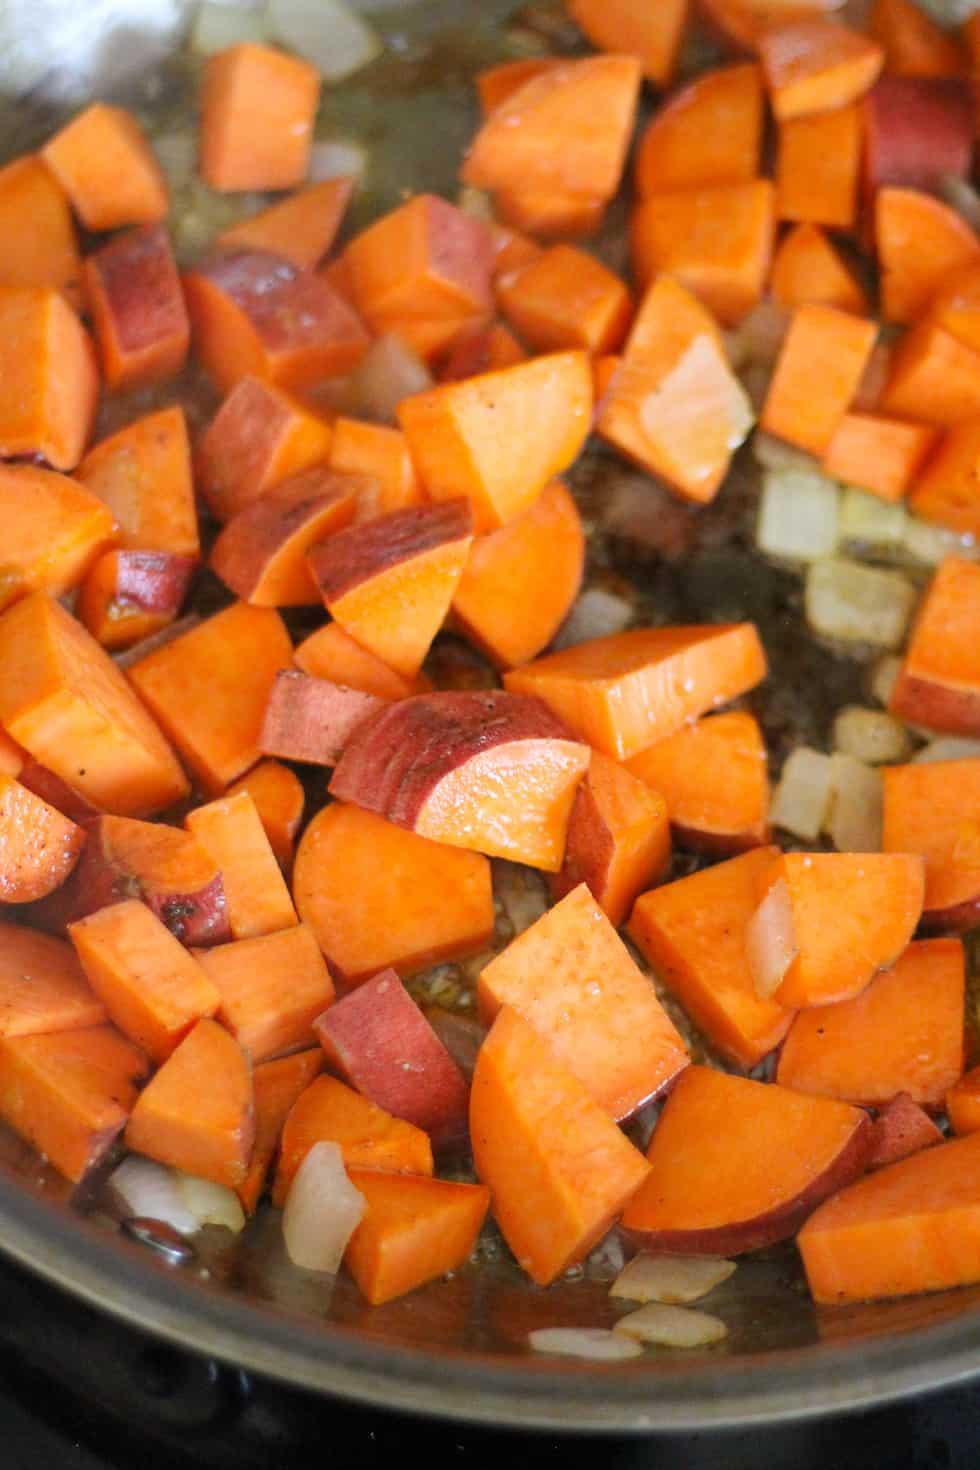 Sweet potatoes in frypan.